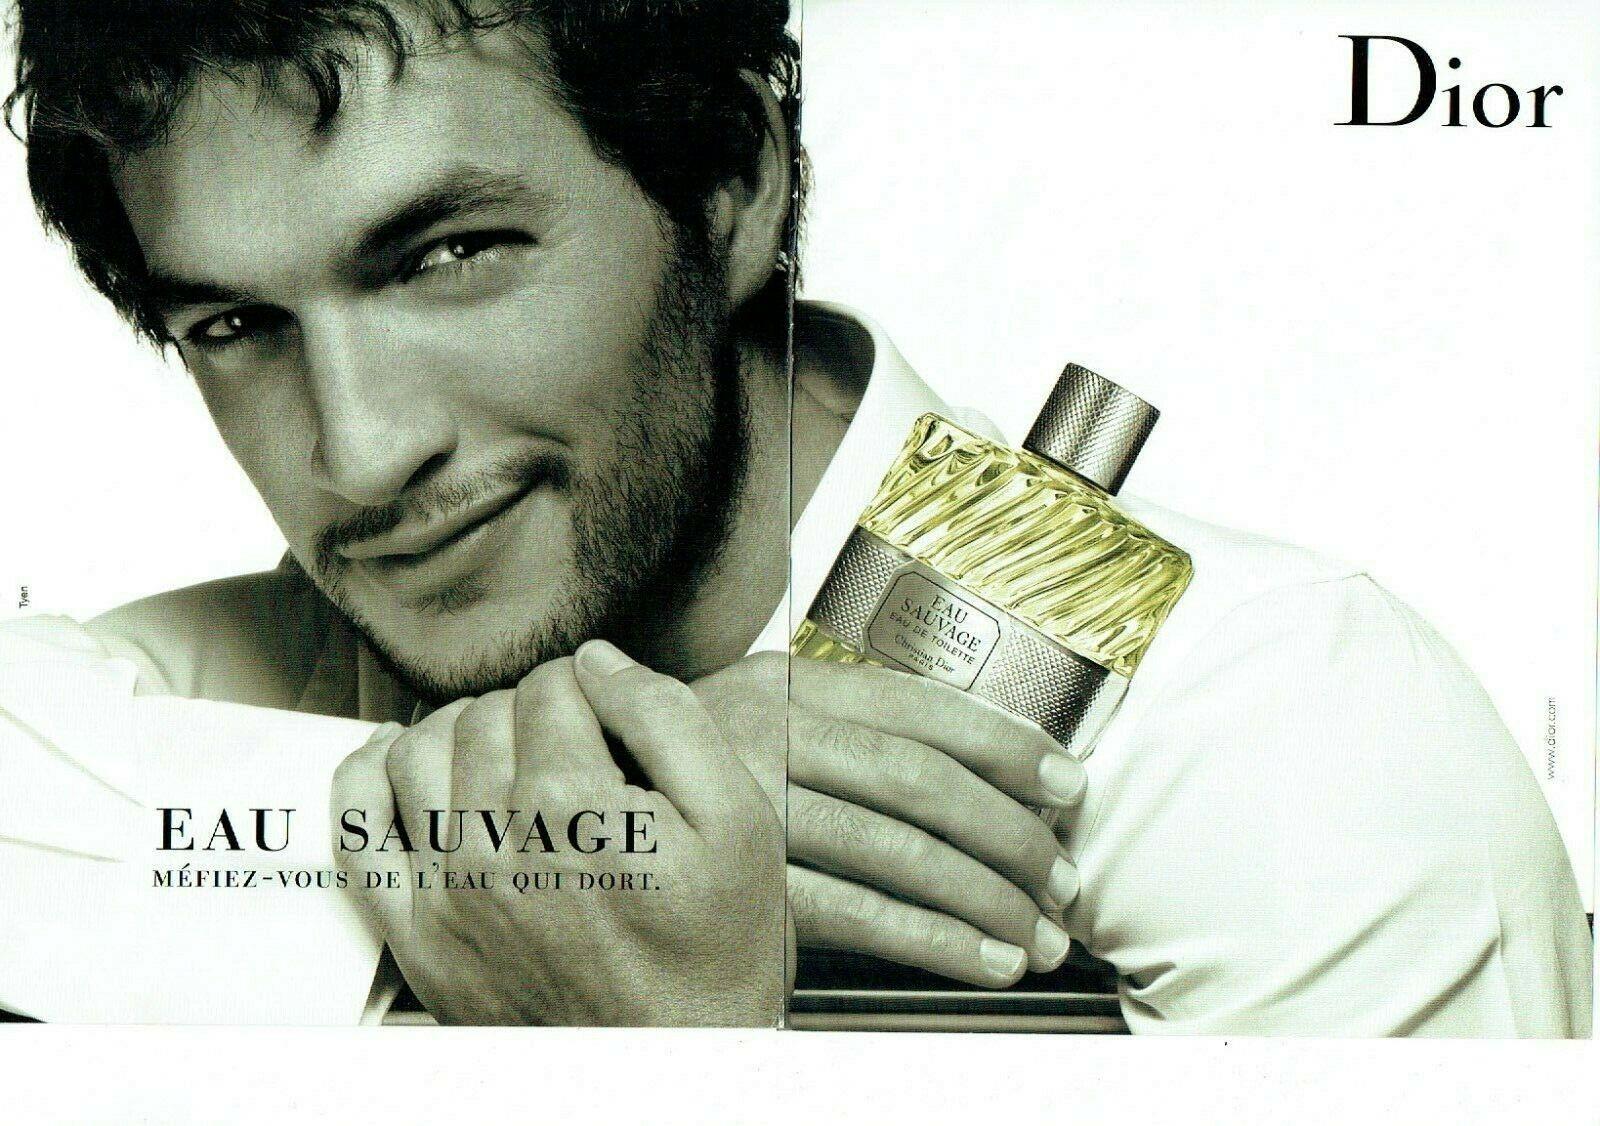 2003 Dior Eau sauvage